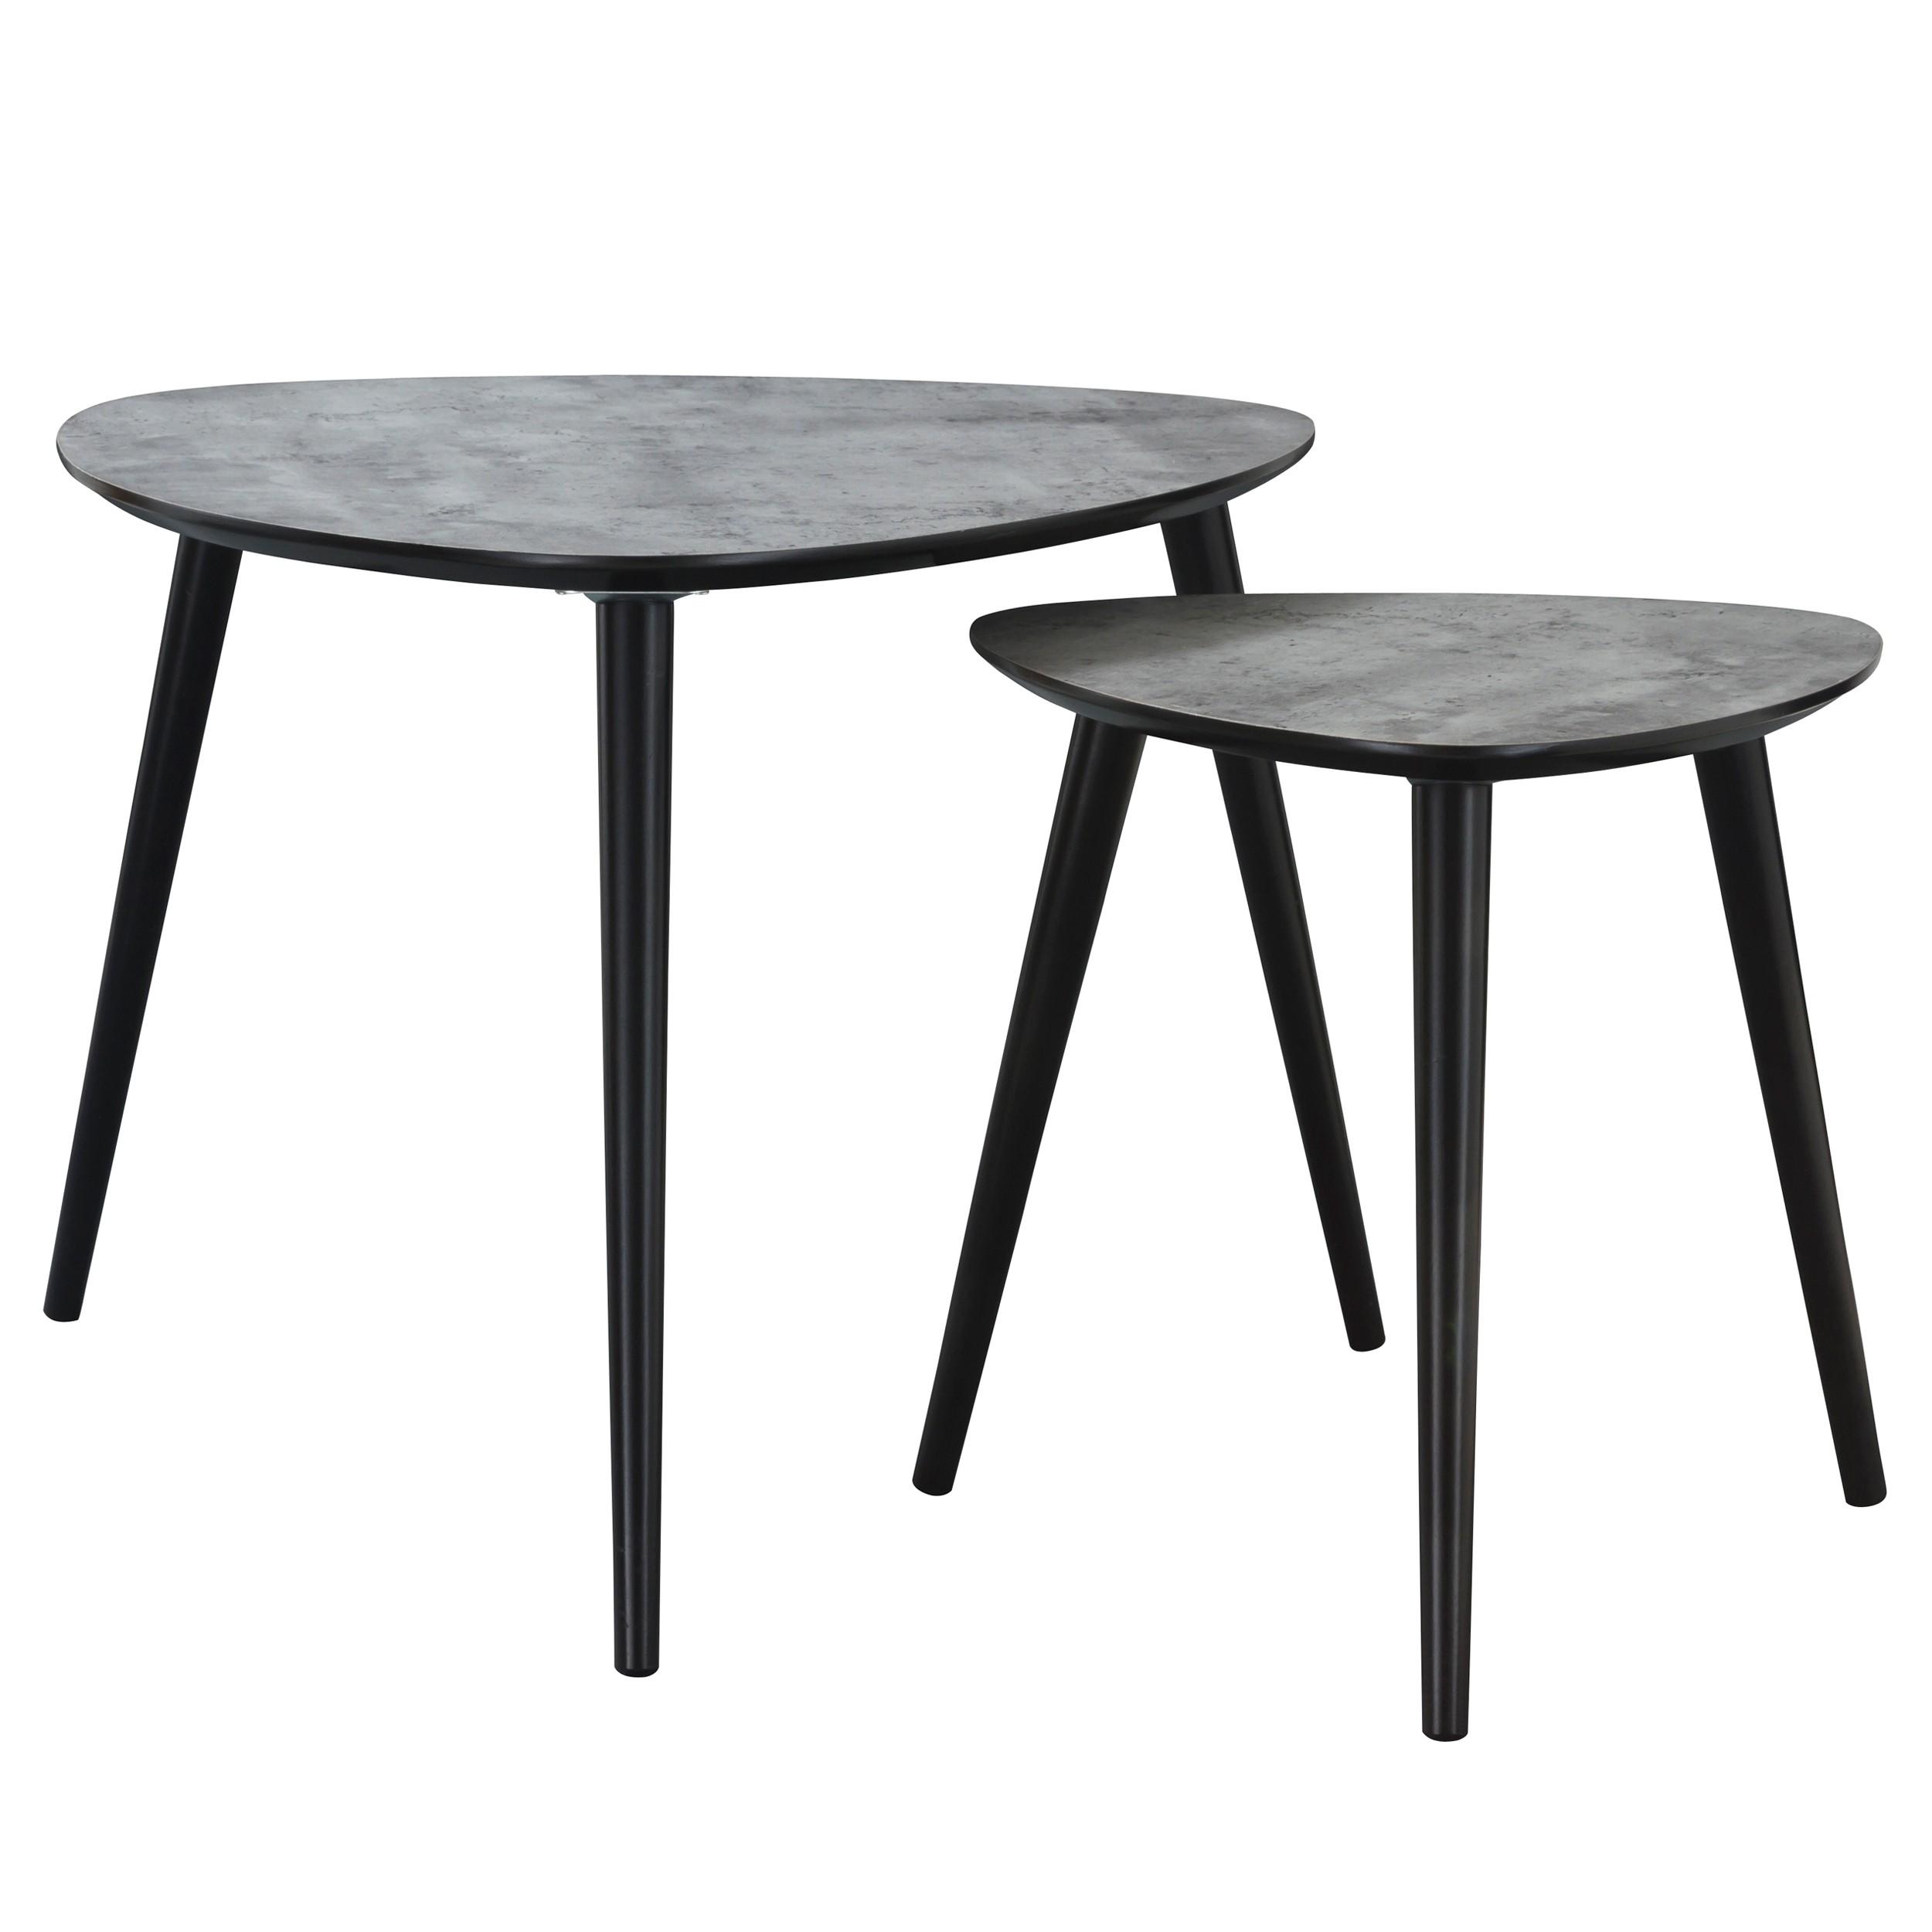 table basse scandinave effet b ton lot de 2 commandez. Black Bedroom Furniture Sets. Home Design Ideas